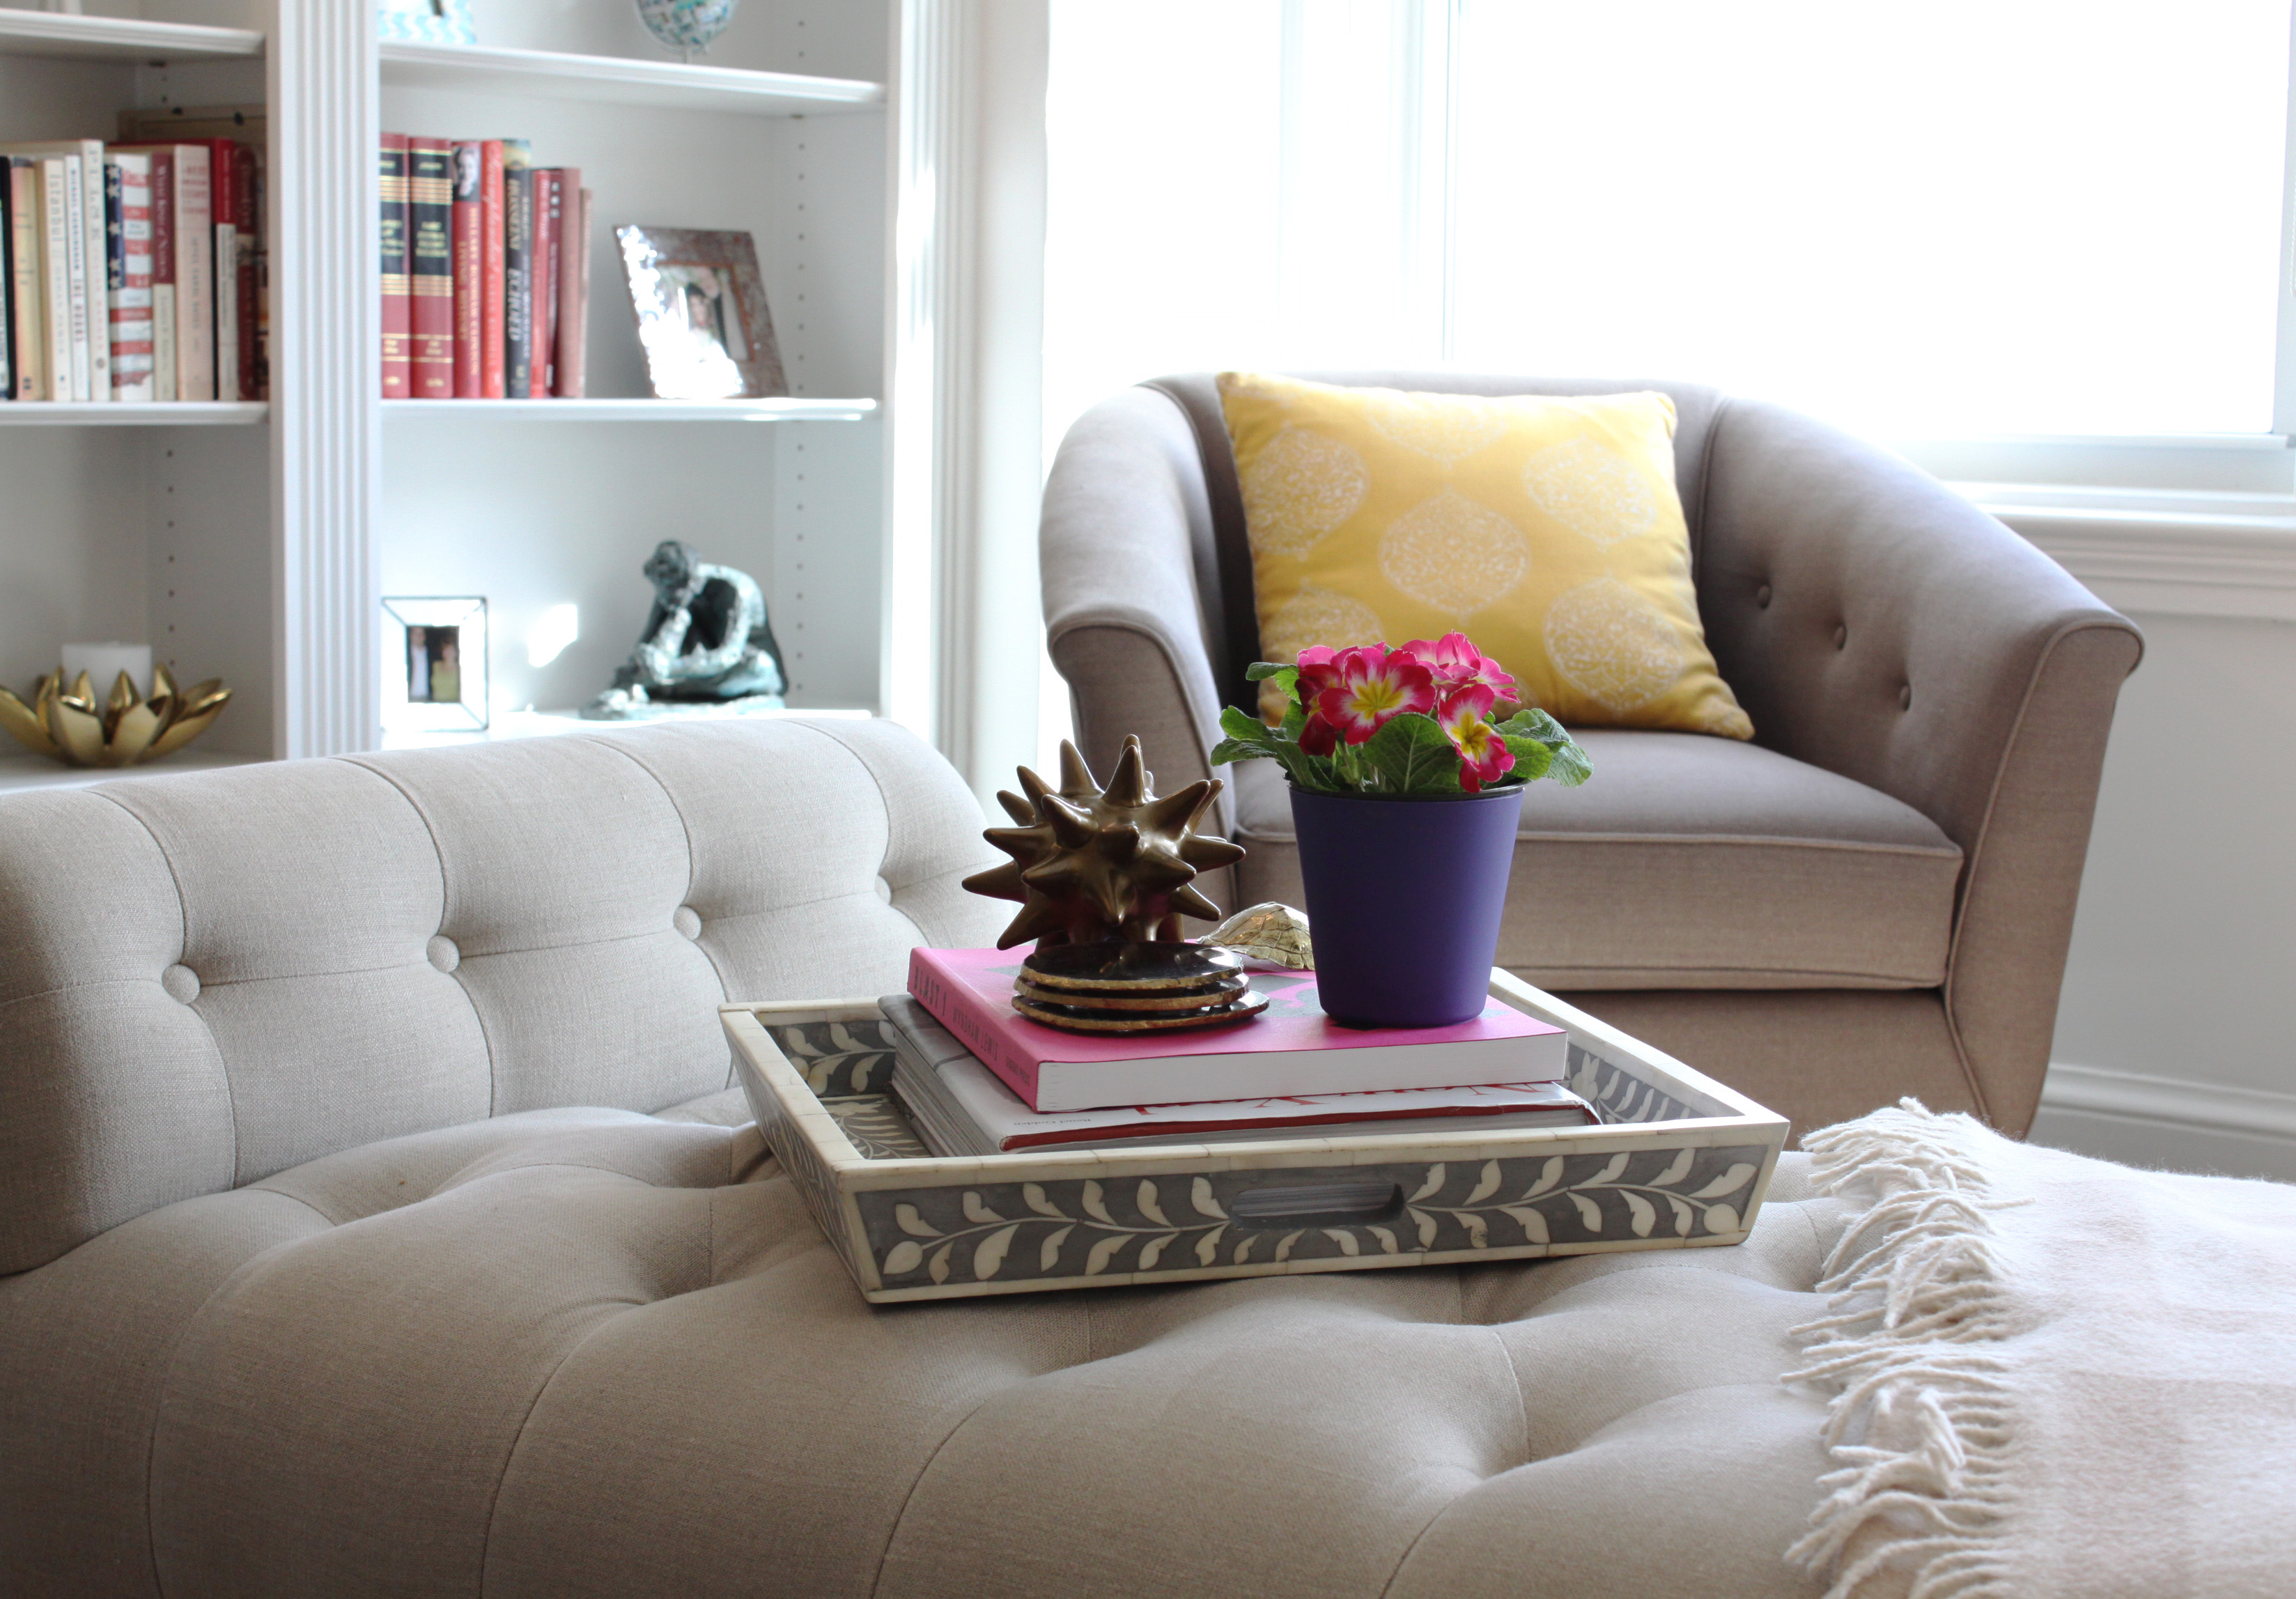 ... London Interior Designer On A Budget_Modern_Eclectic_Bold_Unpretentious Interior  Design In London ...